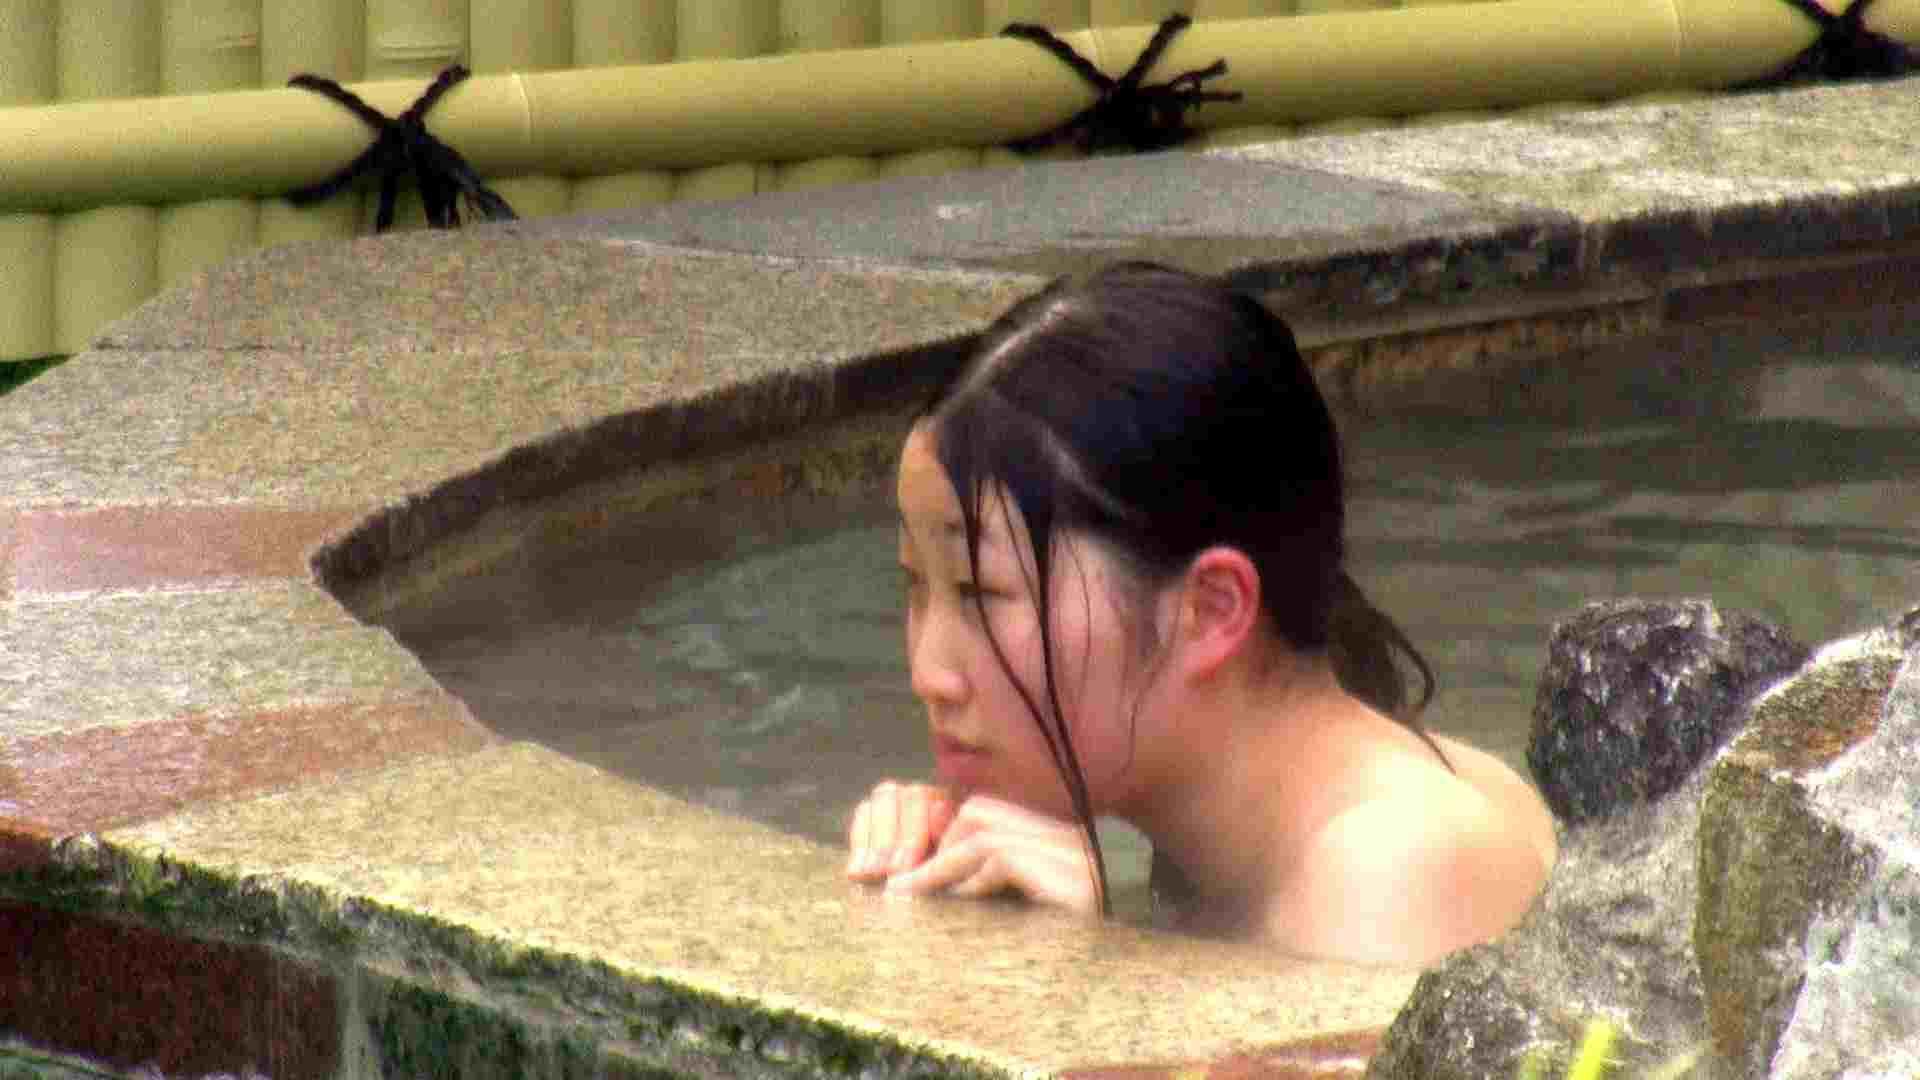 Aquaな露天風呂Vol.218 OLエロ画像 盗撮オマンコ無修正動画無料 81PICs 38